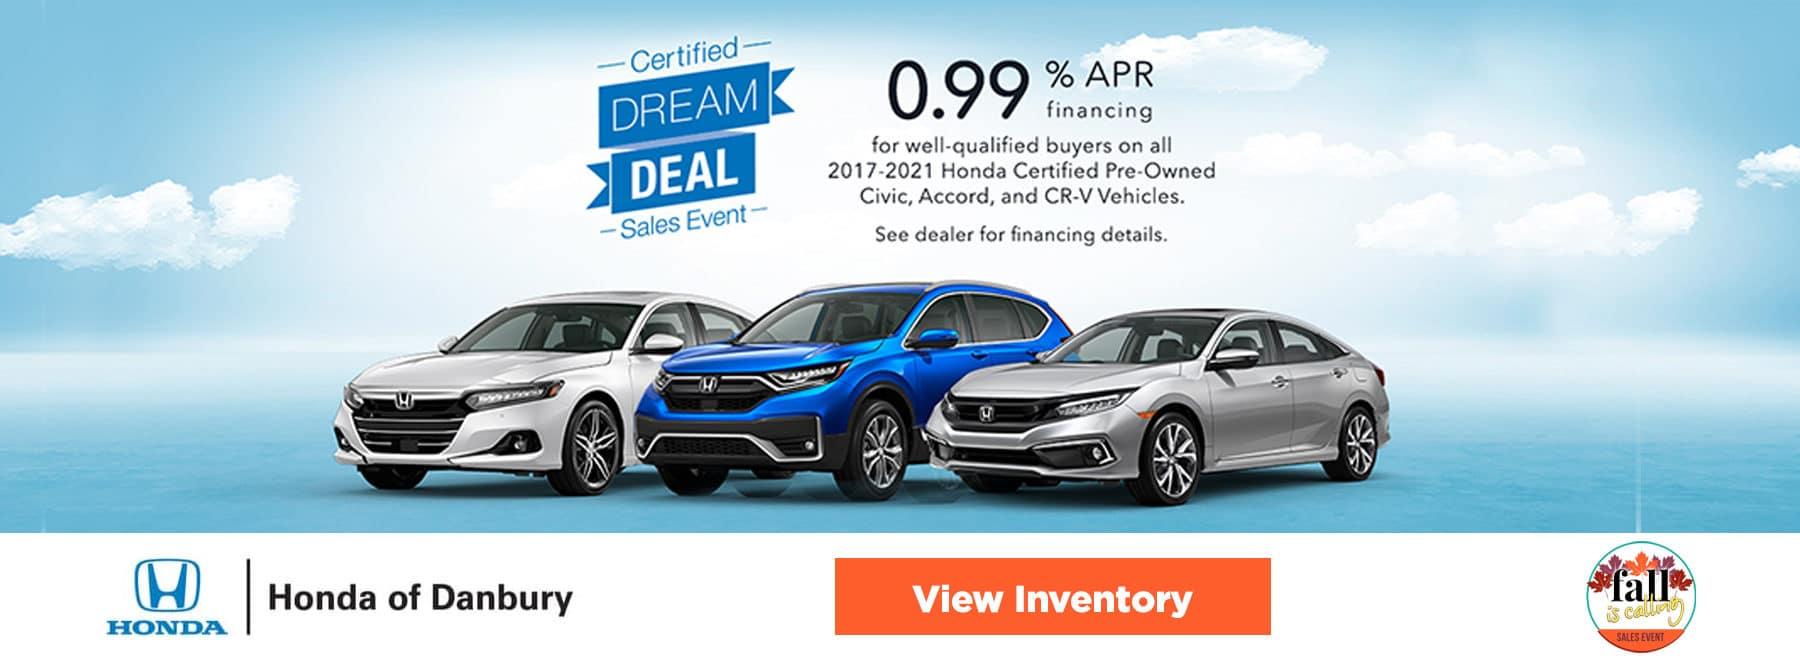 0.99% APR financing for all 2017-2021 CPO Honda Civics, Accords, CR-V's